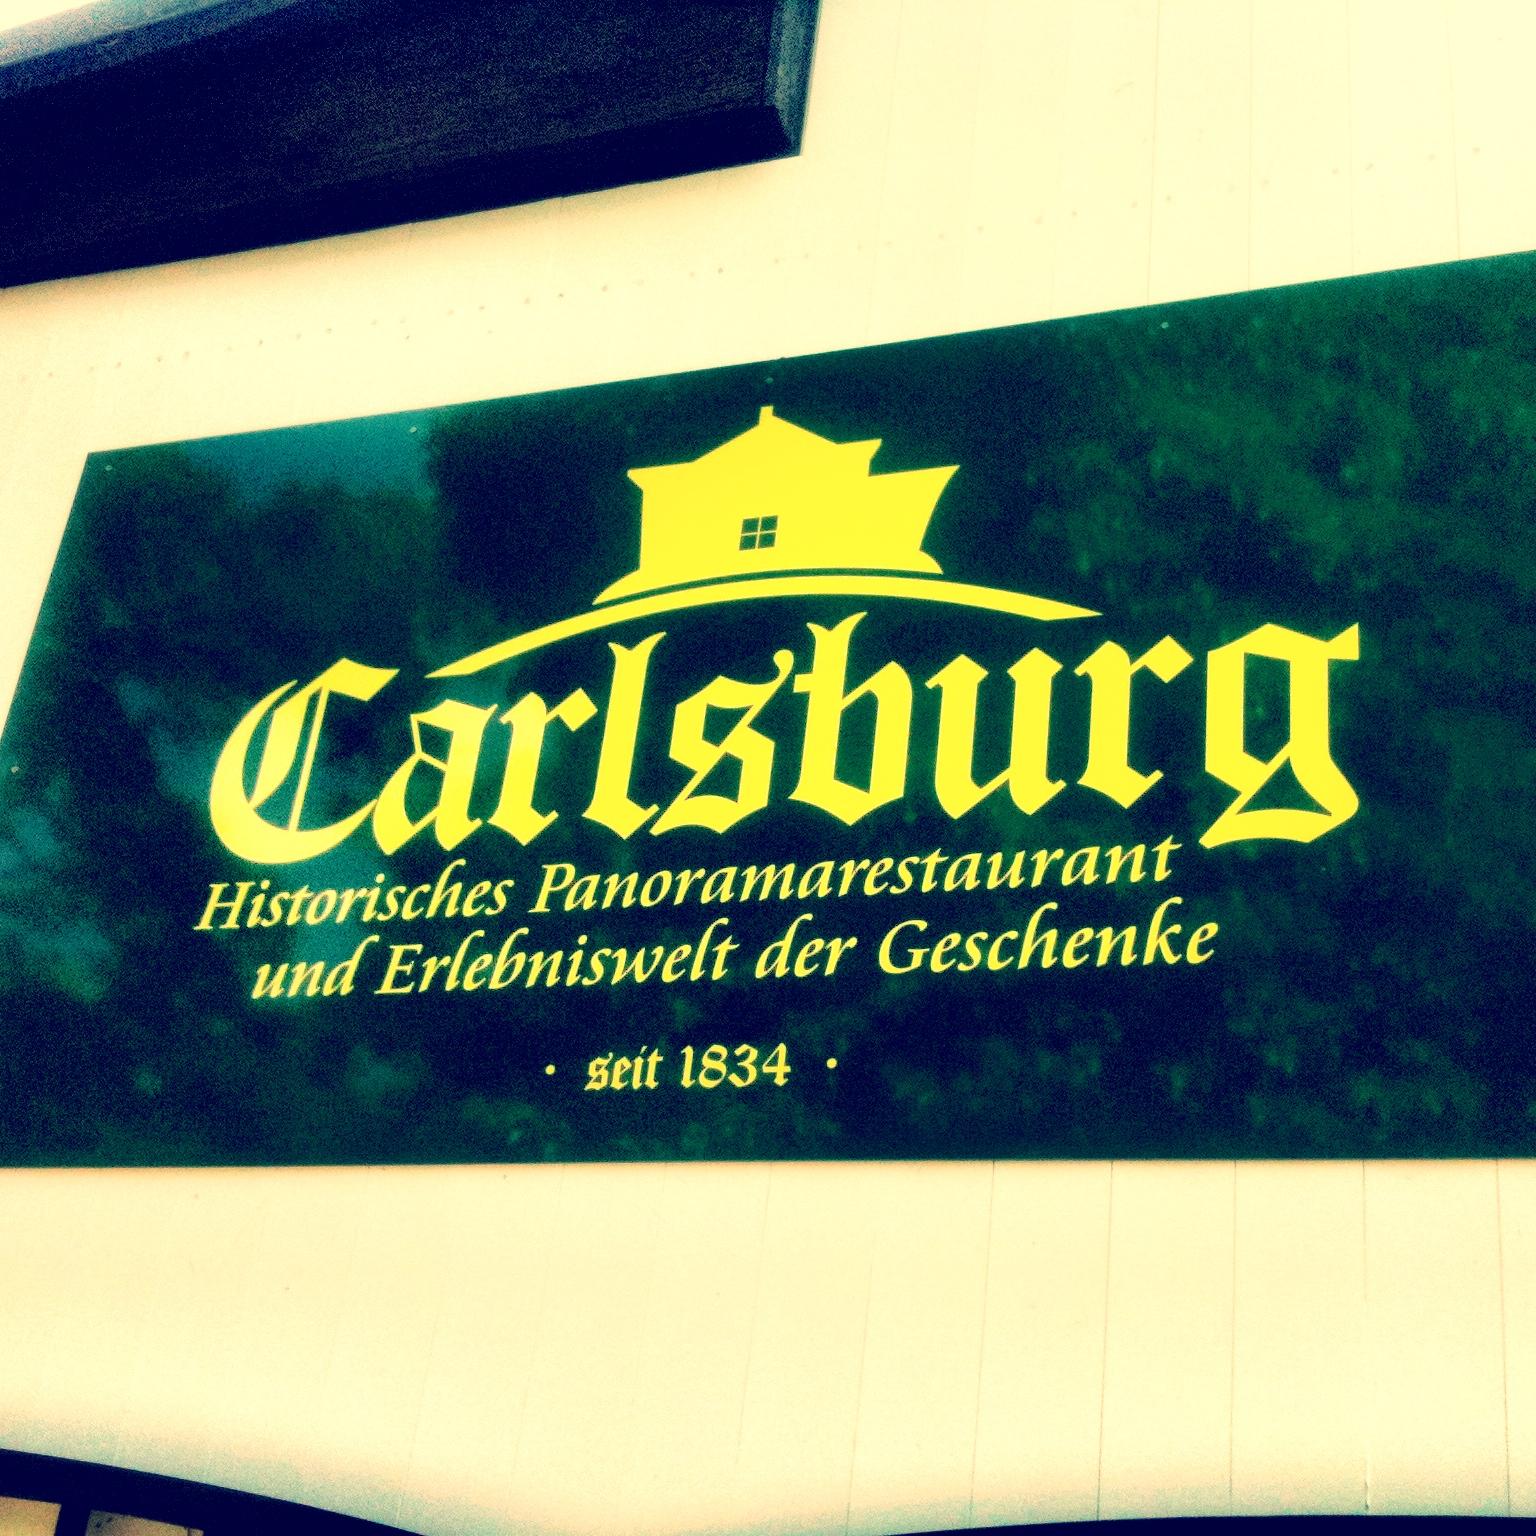 Carlsburg - Das Panoramarestaurant